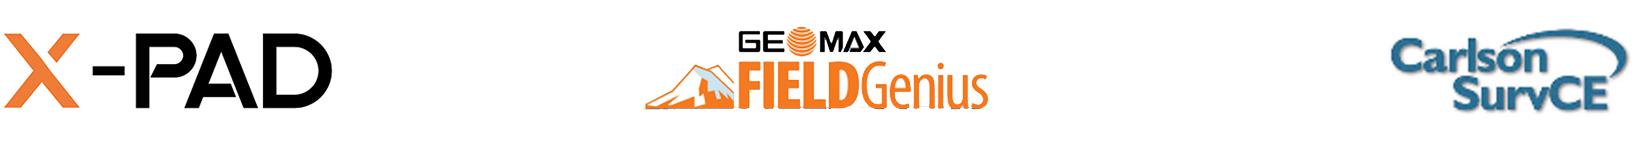 Logotipos Xpad, Geomax FieldGenius y Carlson SurvCE